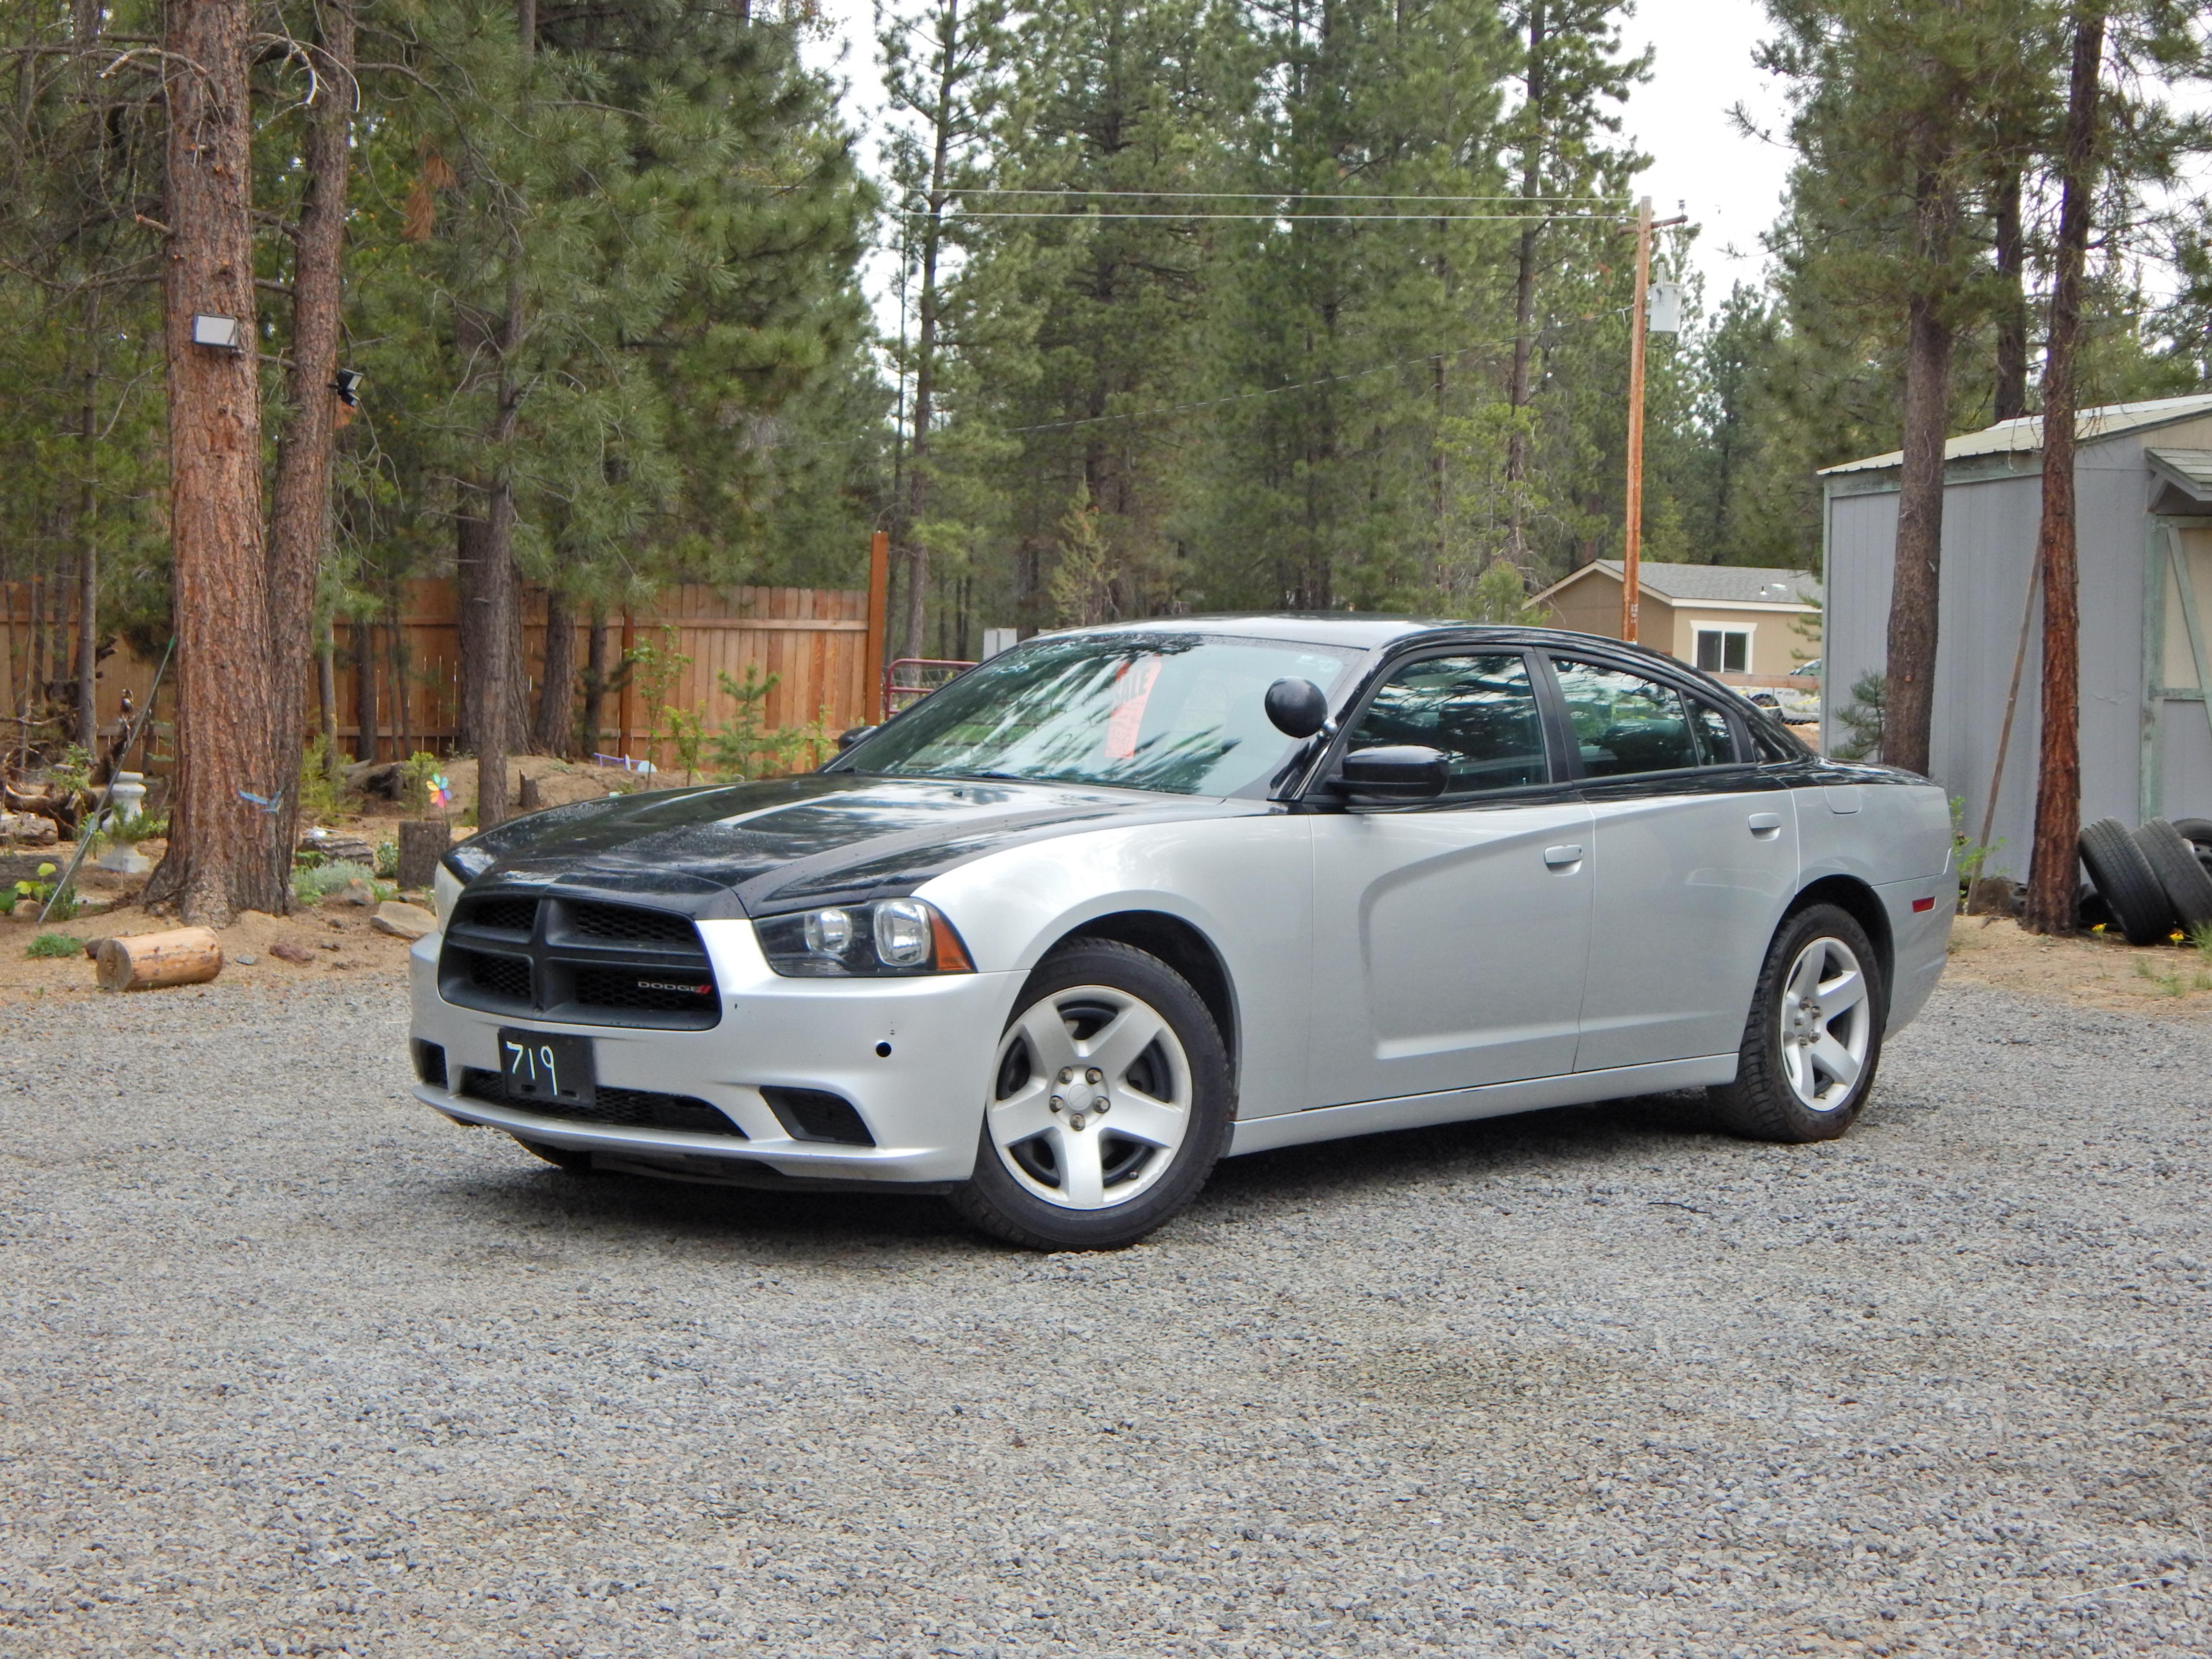 2012 Dodge Charger 5.7L Hemi 98k mi.!! - Interceptor King